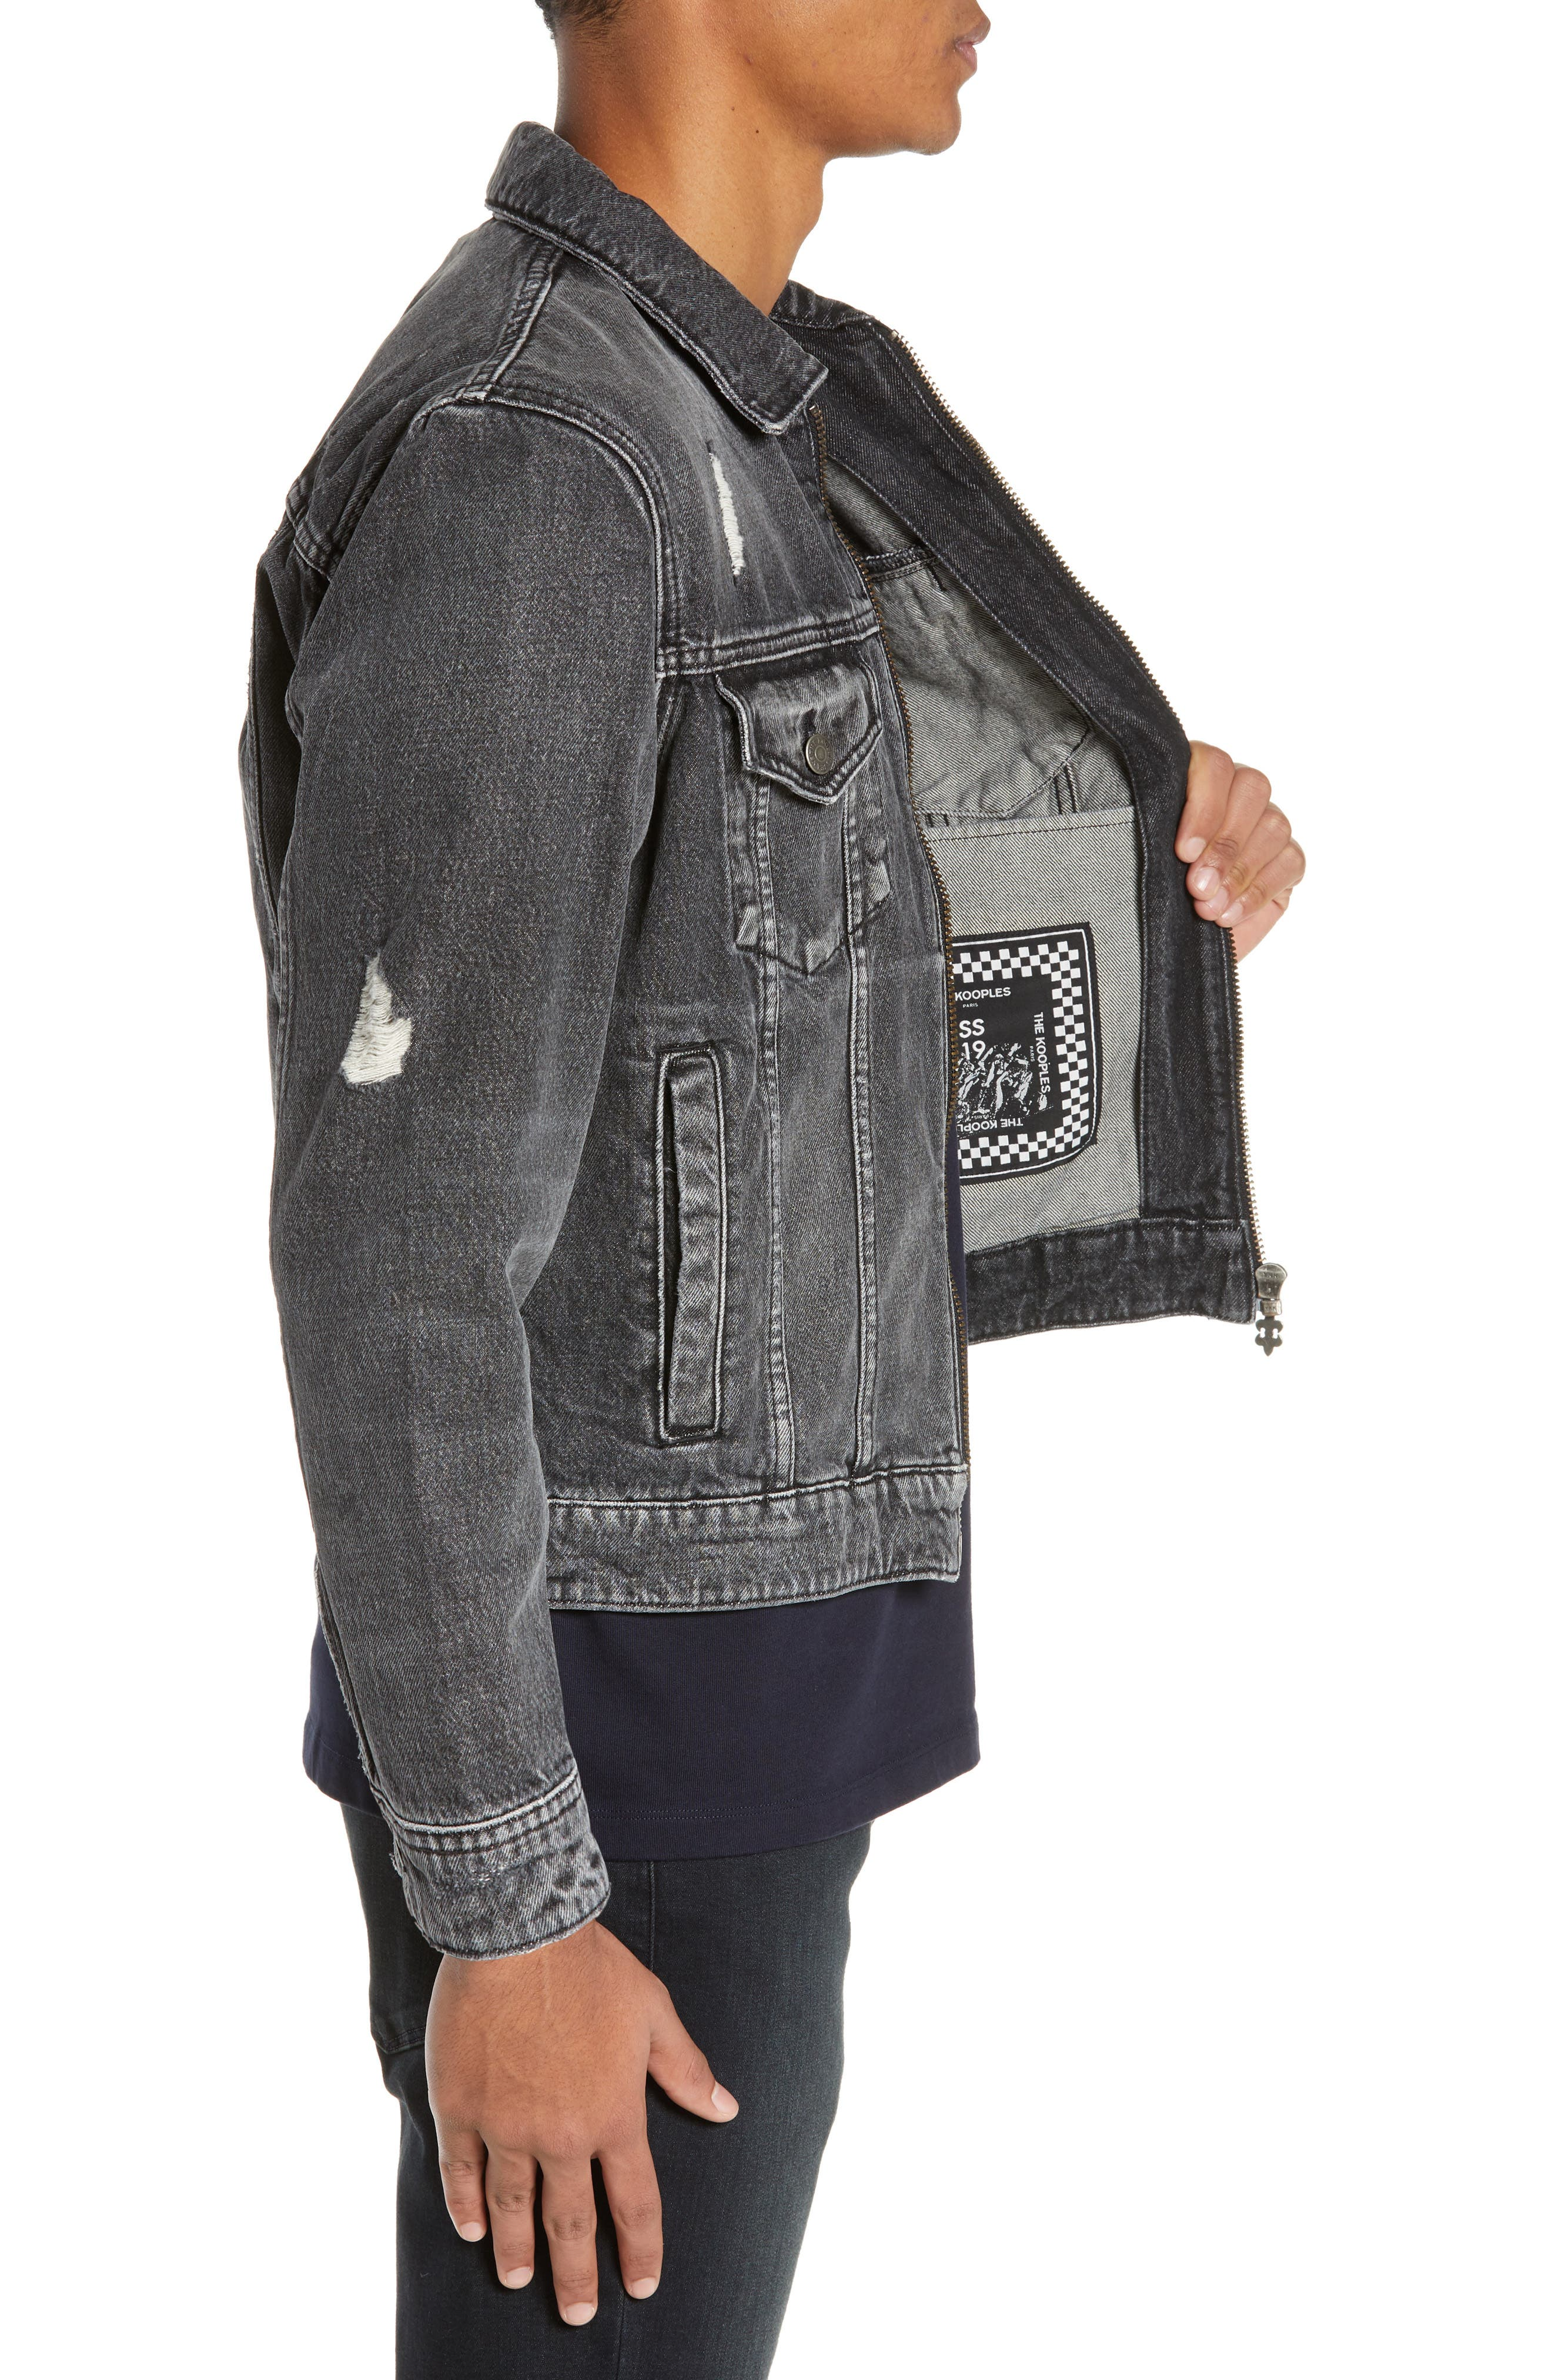 THE KOOPLES, Slim Fit Denim Jacket, Alternate thumbnail 4, color, BLACK DENIM EFFECT